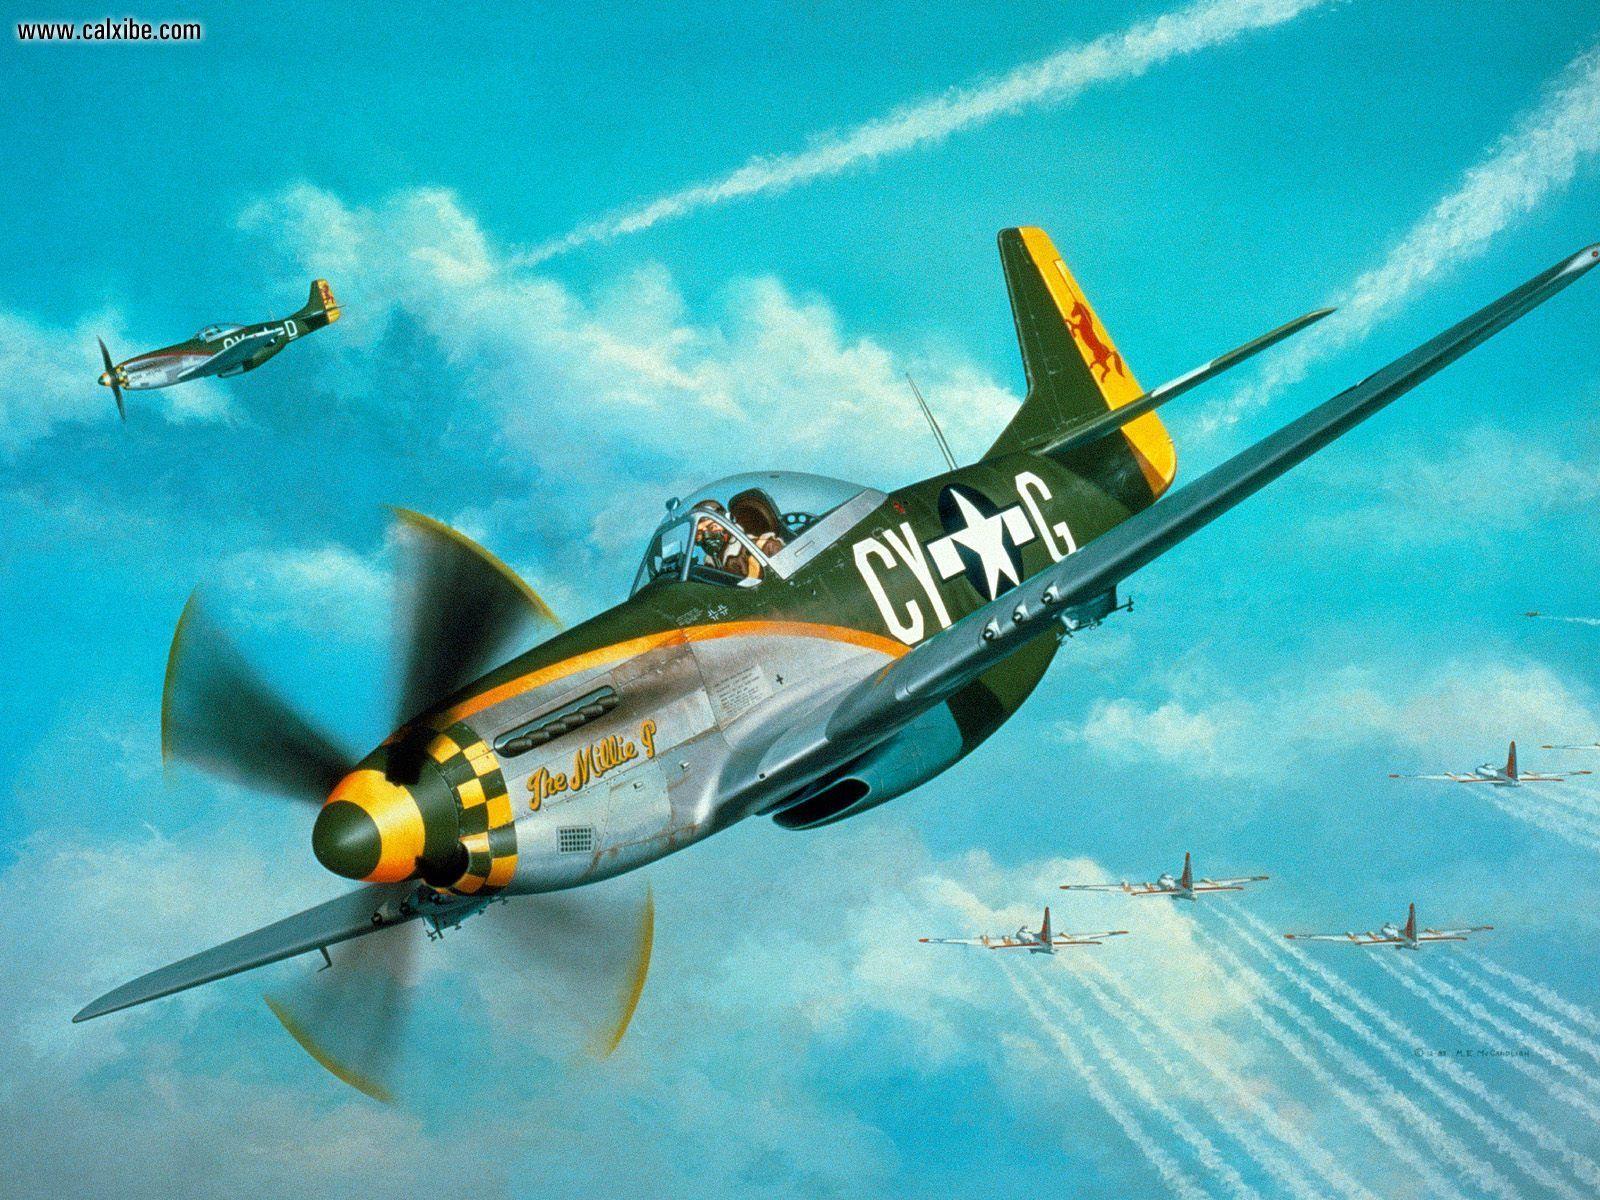 Jet Fighter clipart ww2 plane #12